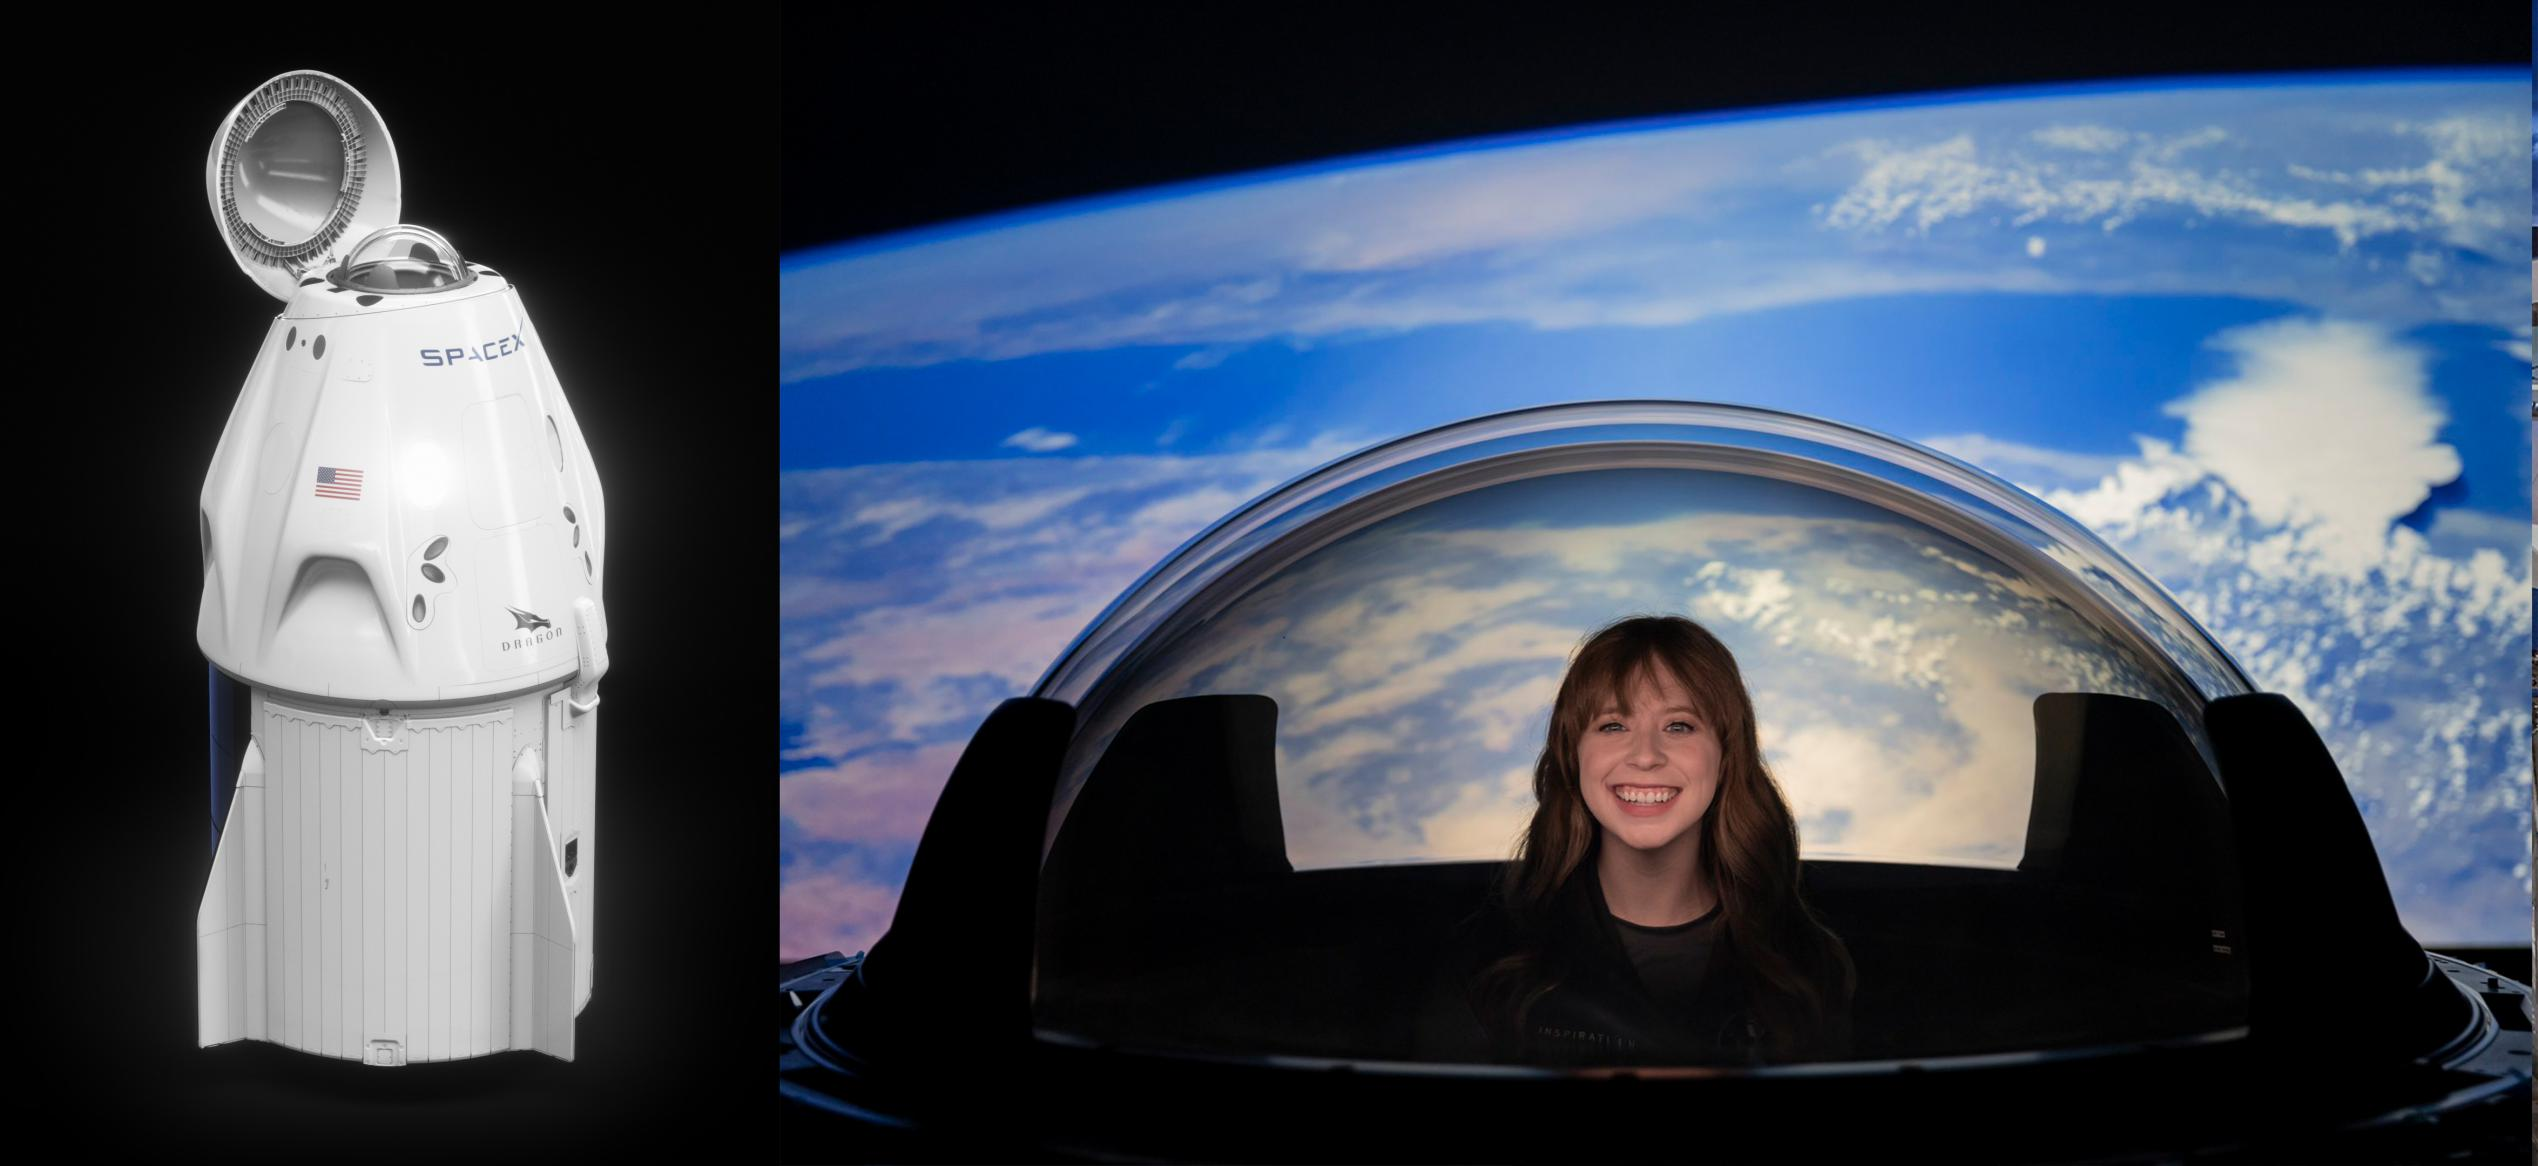 Inspiration4 Dragon cupola render (SpaceX) Haley Arceneaux 1 (c)